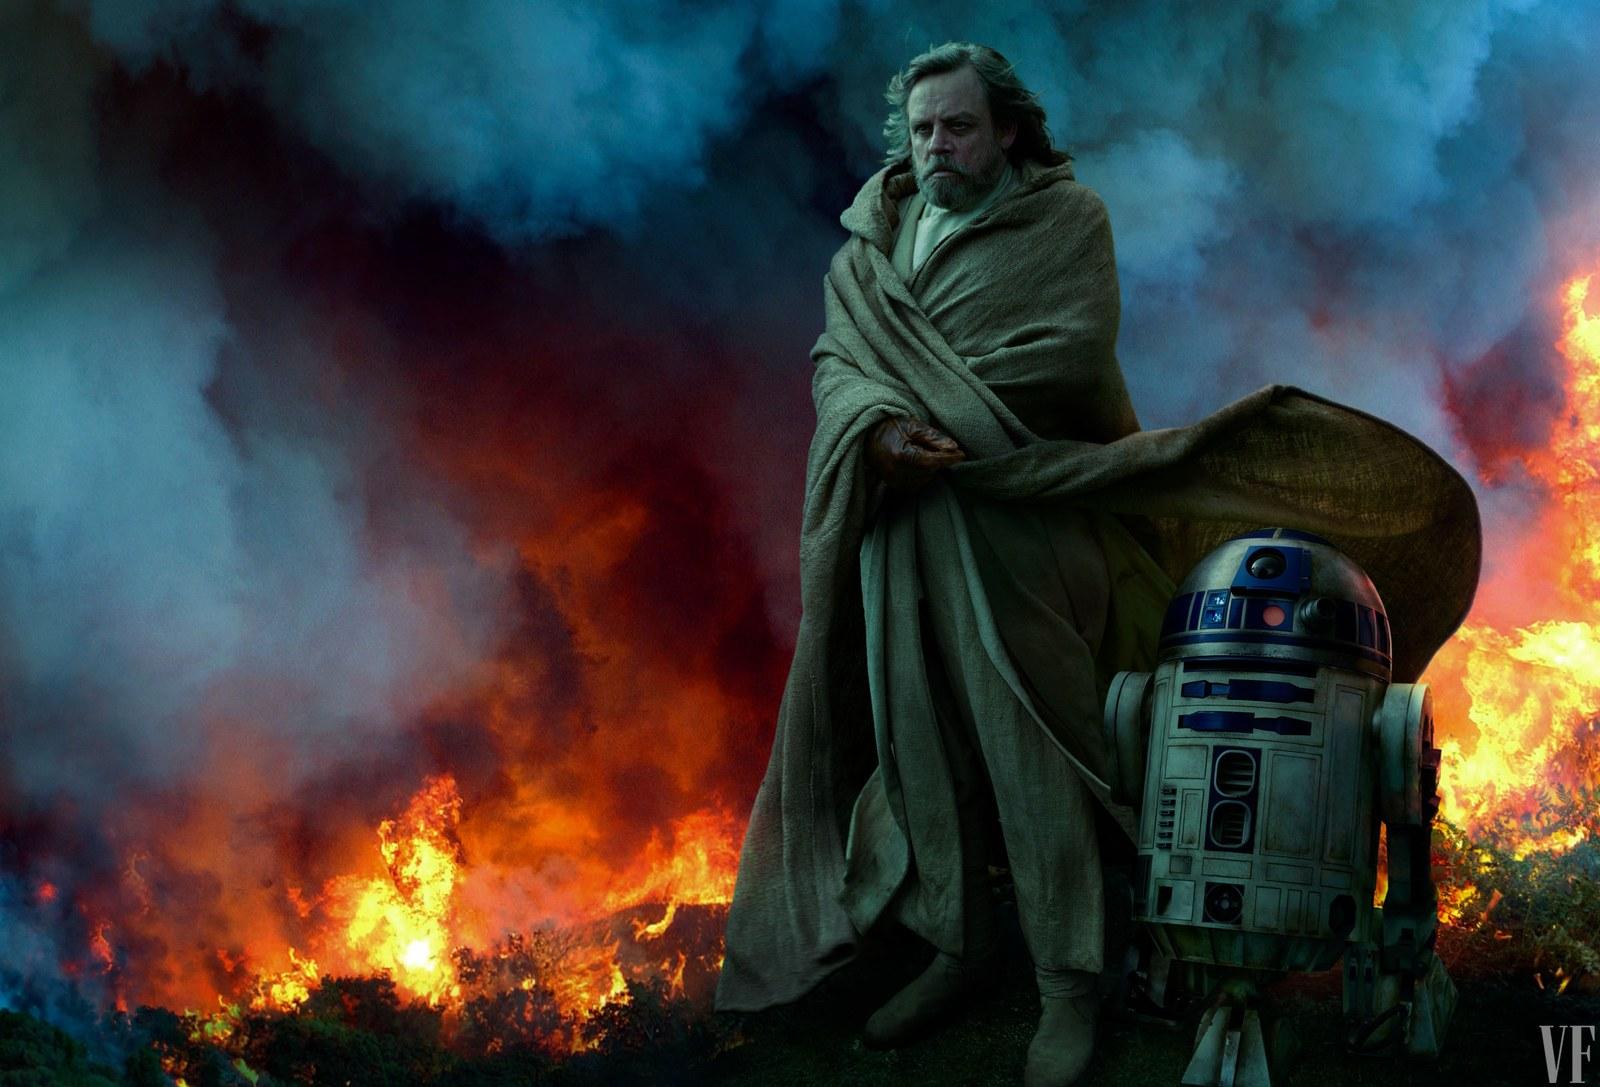 Wallpaper Star Wars Episode Ix The Rise Of Skywalker Star